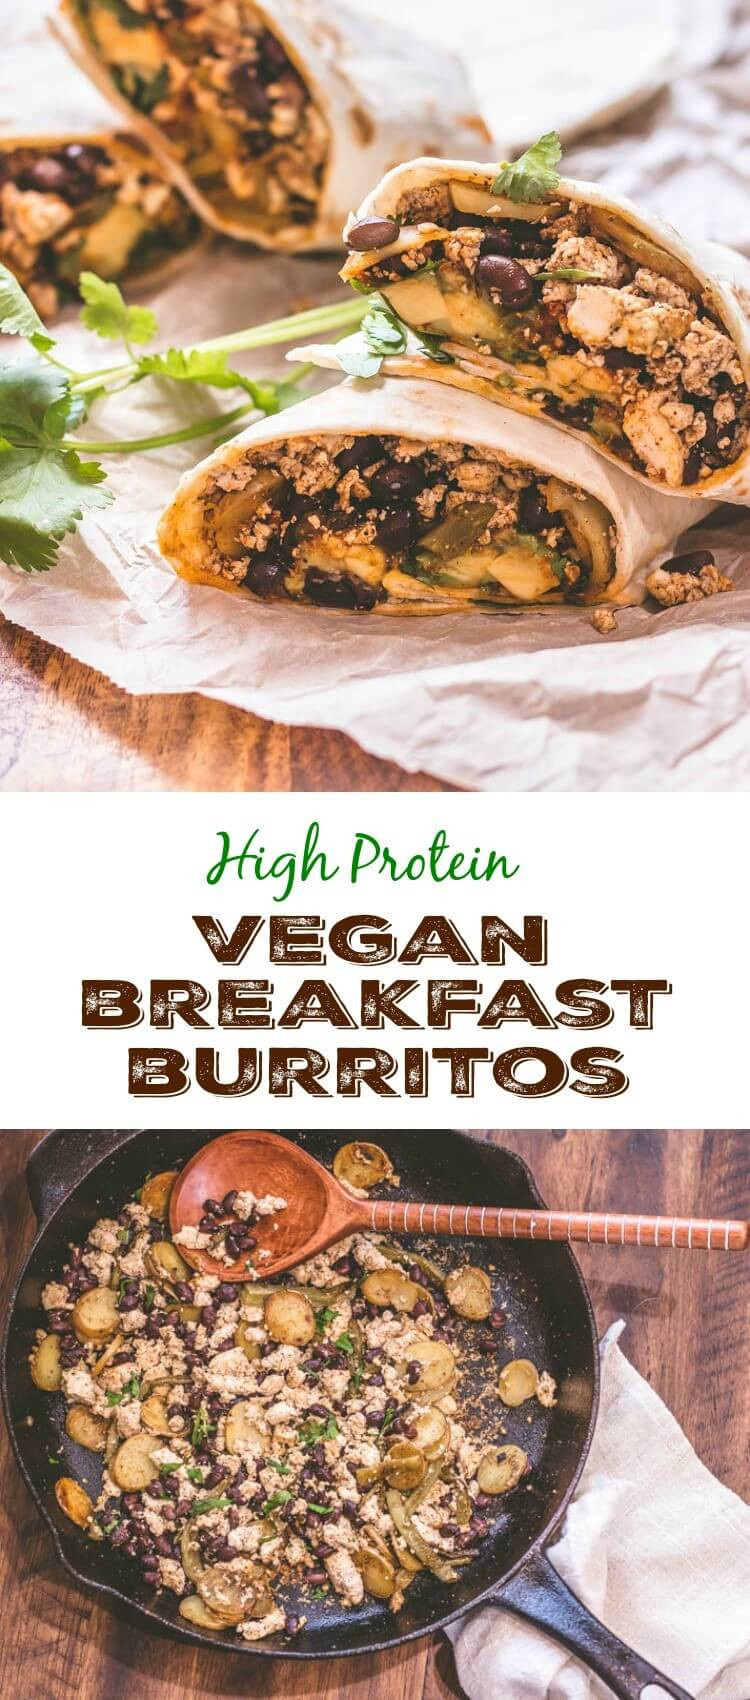 High Protein Vegan Recipes  High Protein Vegan Breakfast Burritos Beyond Mere Sustenance